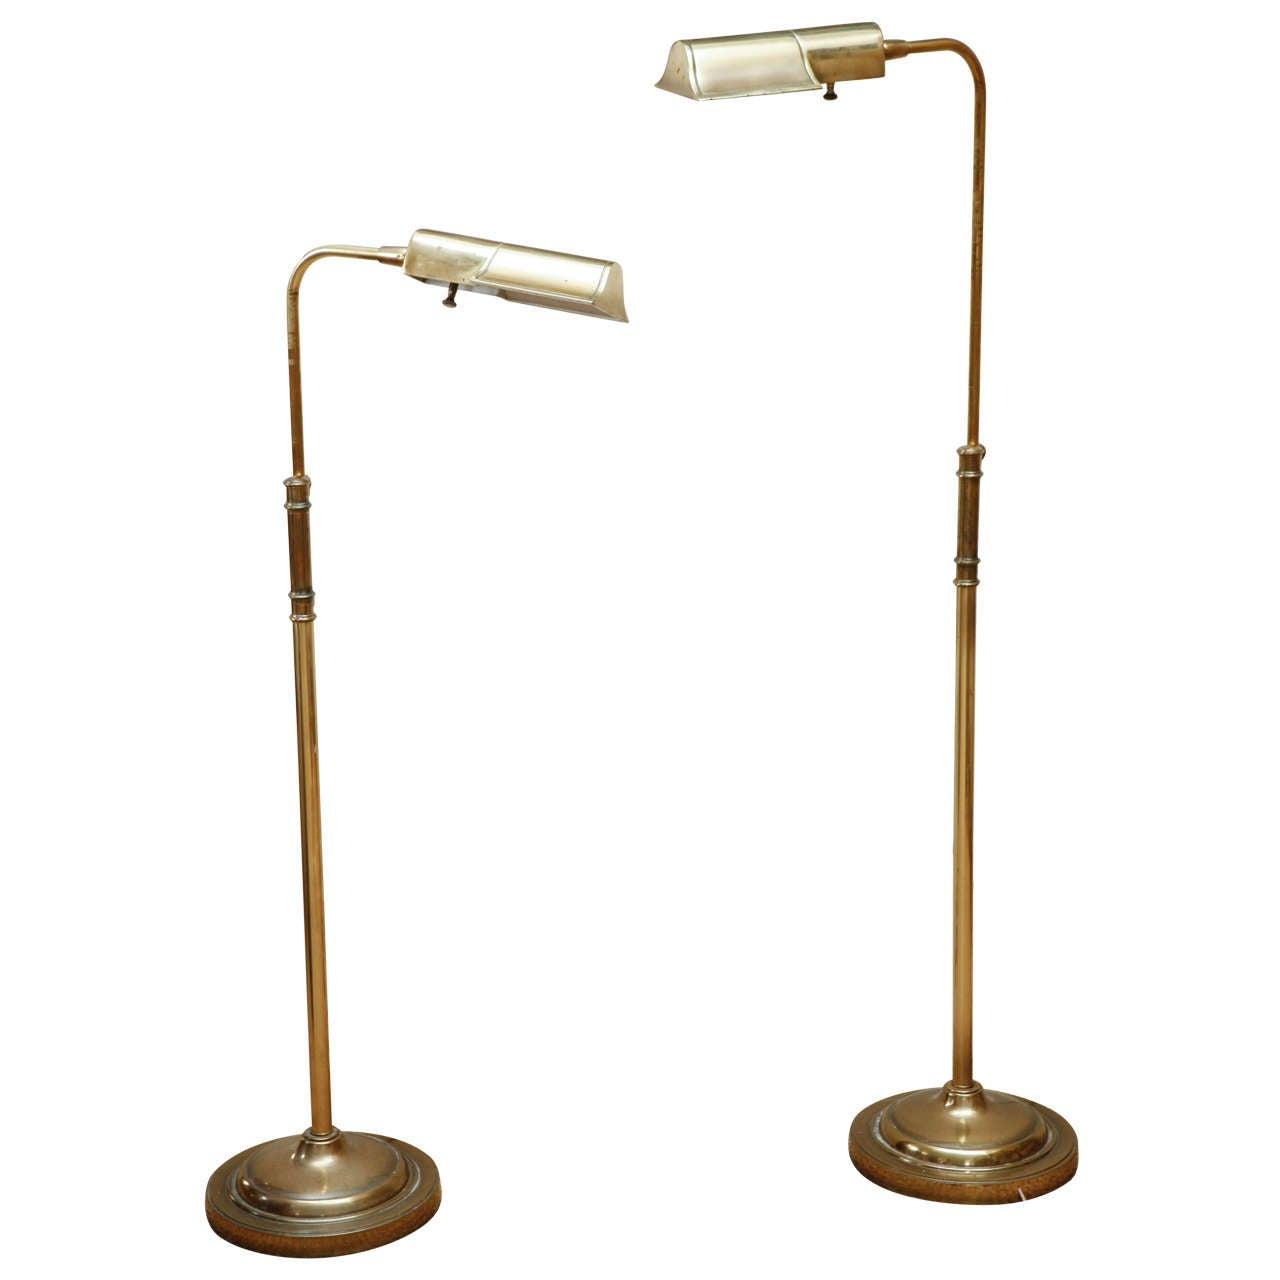 Vintage stiffel task lamps at 1stdibs for Task lighting floor lamp